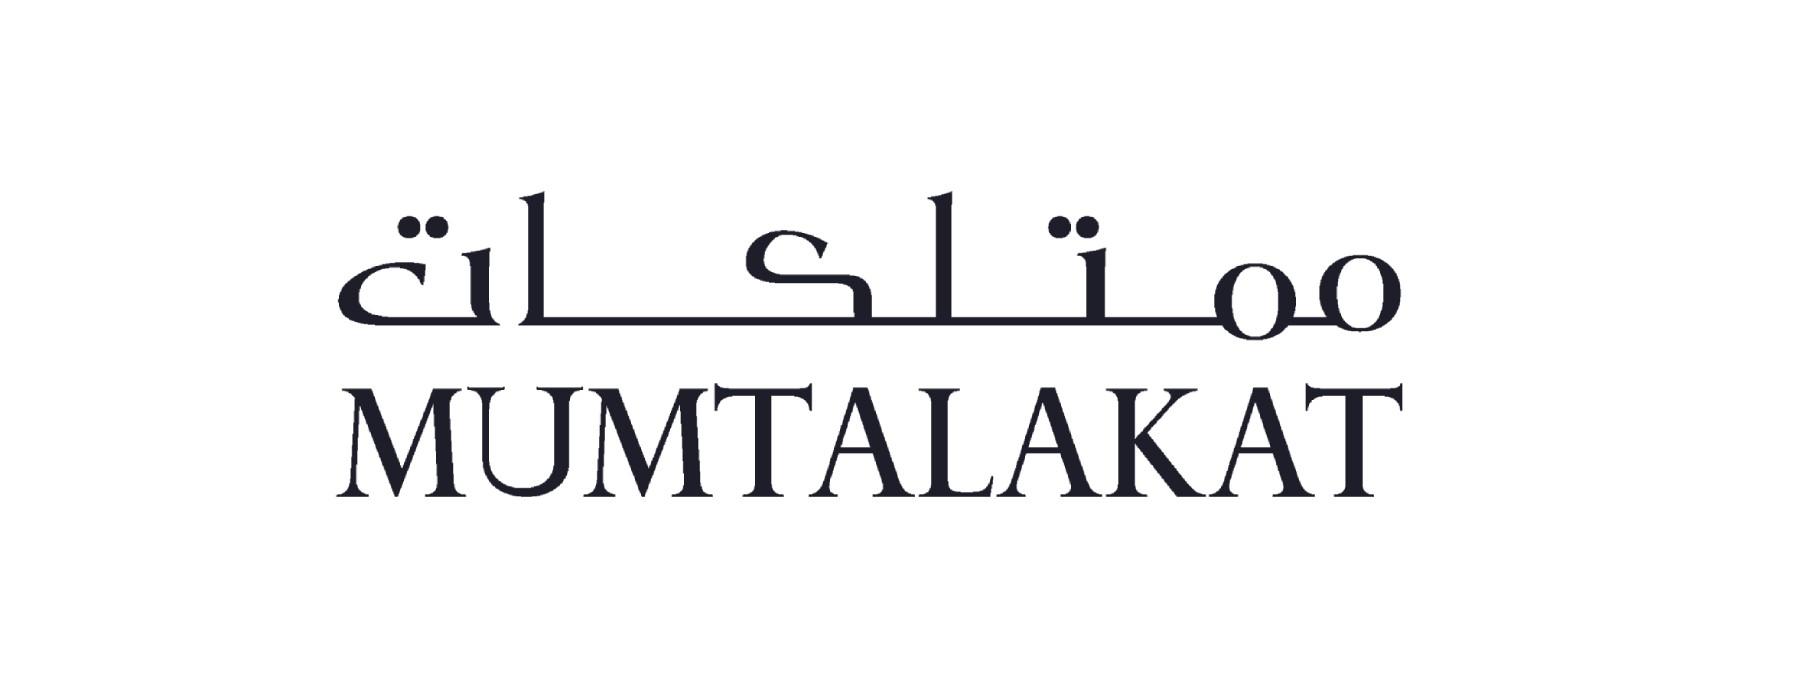 MUMTALAKAT-Saudi-Korean Company for Maintenance and